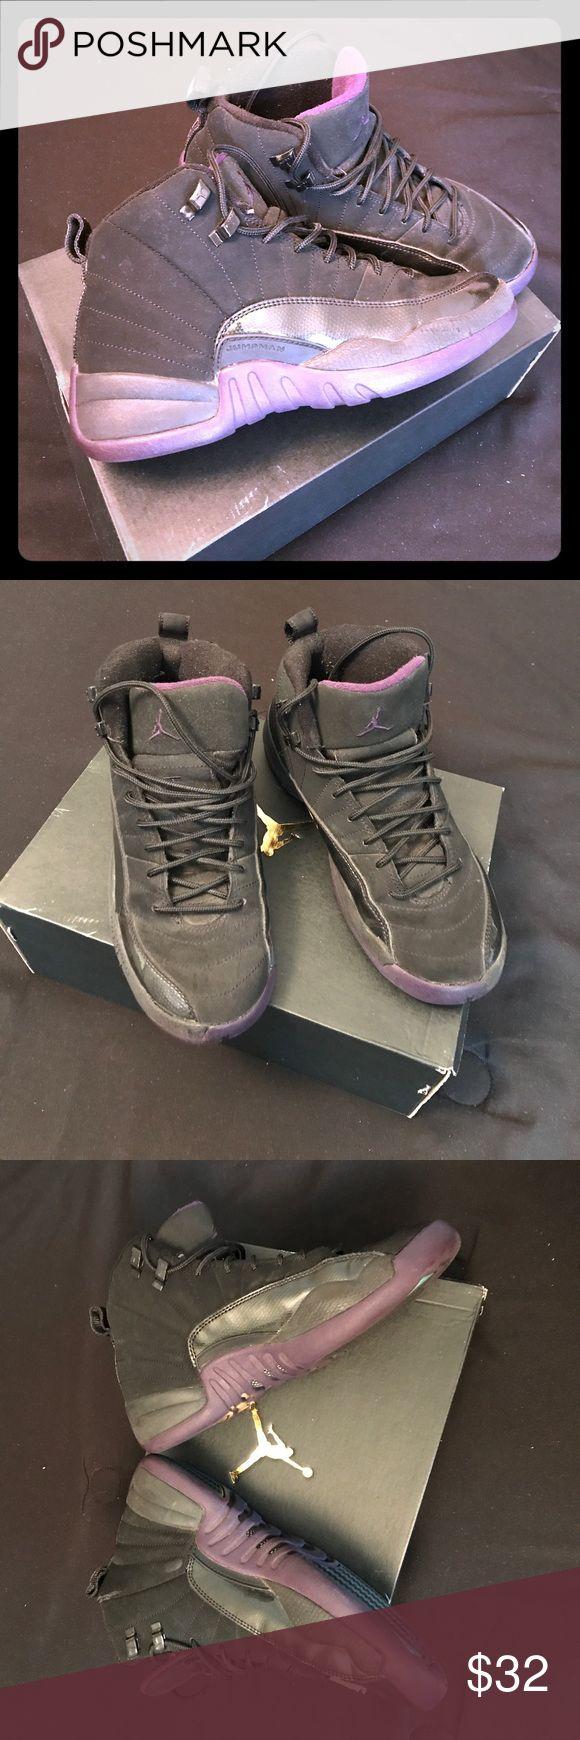 JORDANS Black History Month JORDANS. Black suede with Purple. Good condition. Dusty but lots of wear left Air Jordan Shoes Sneakers